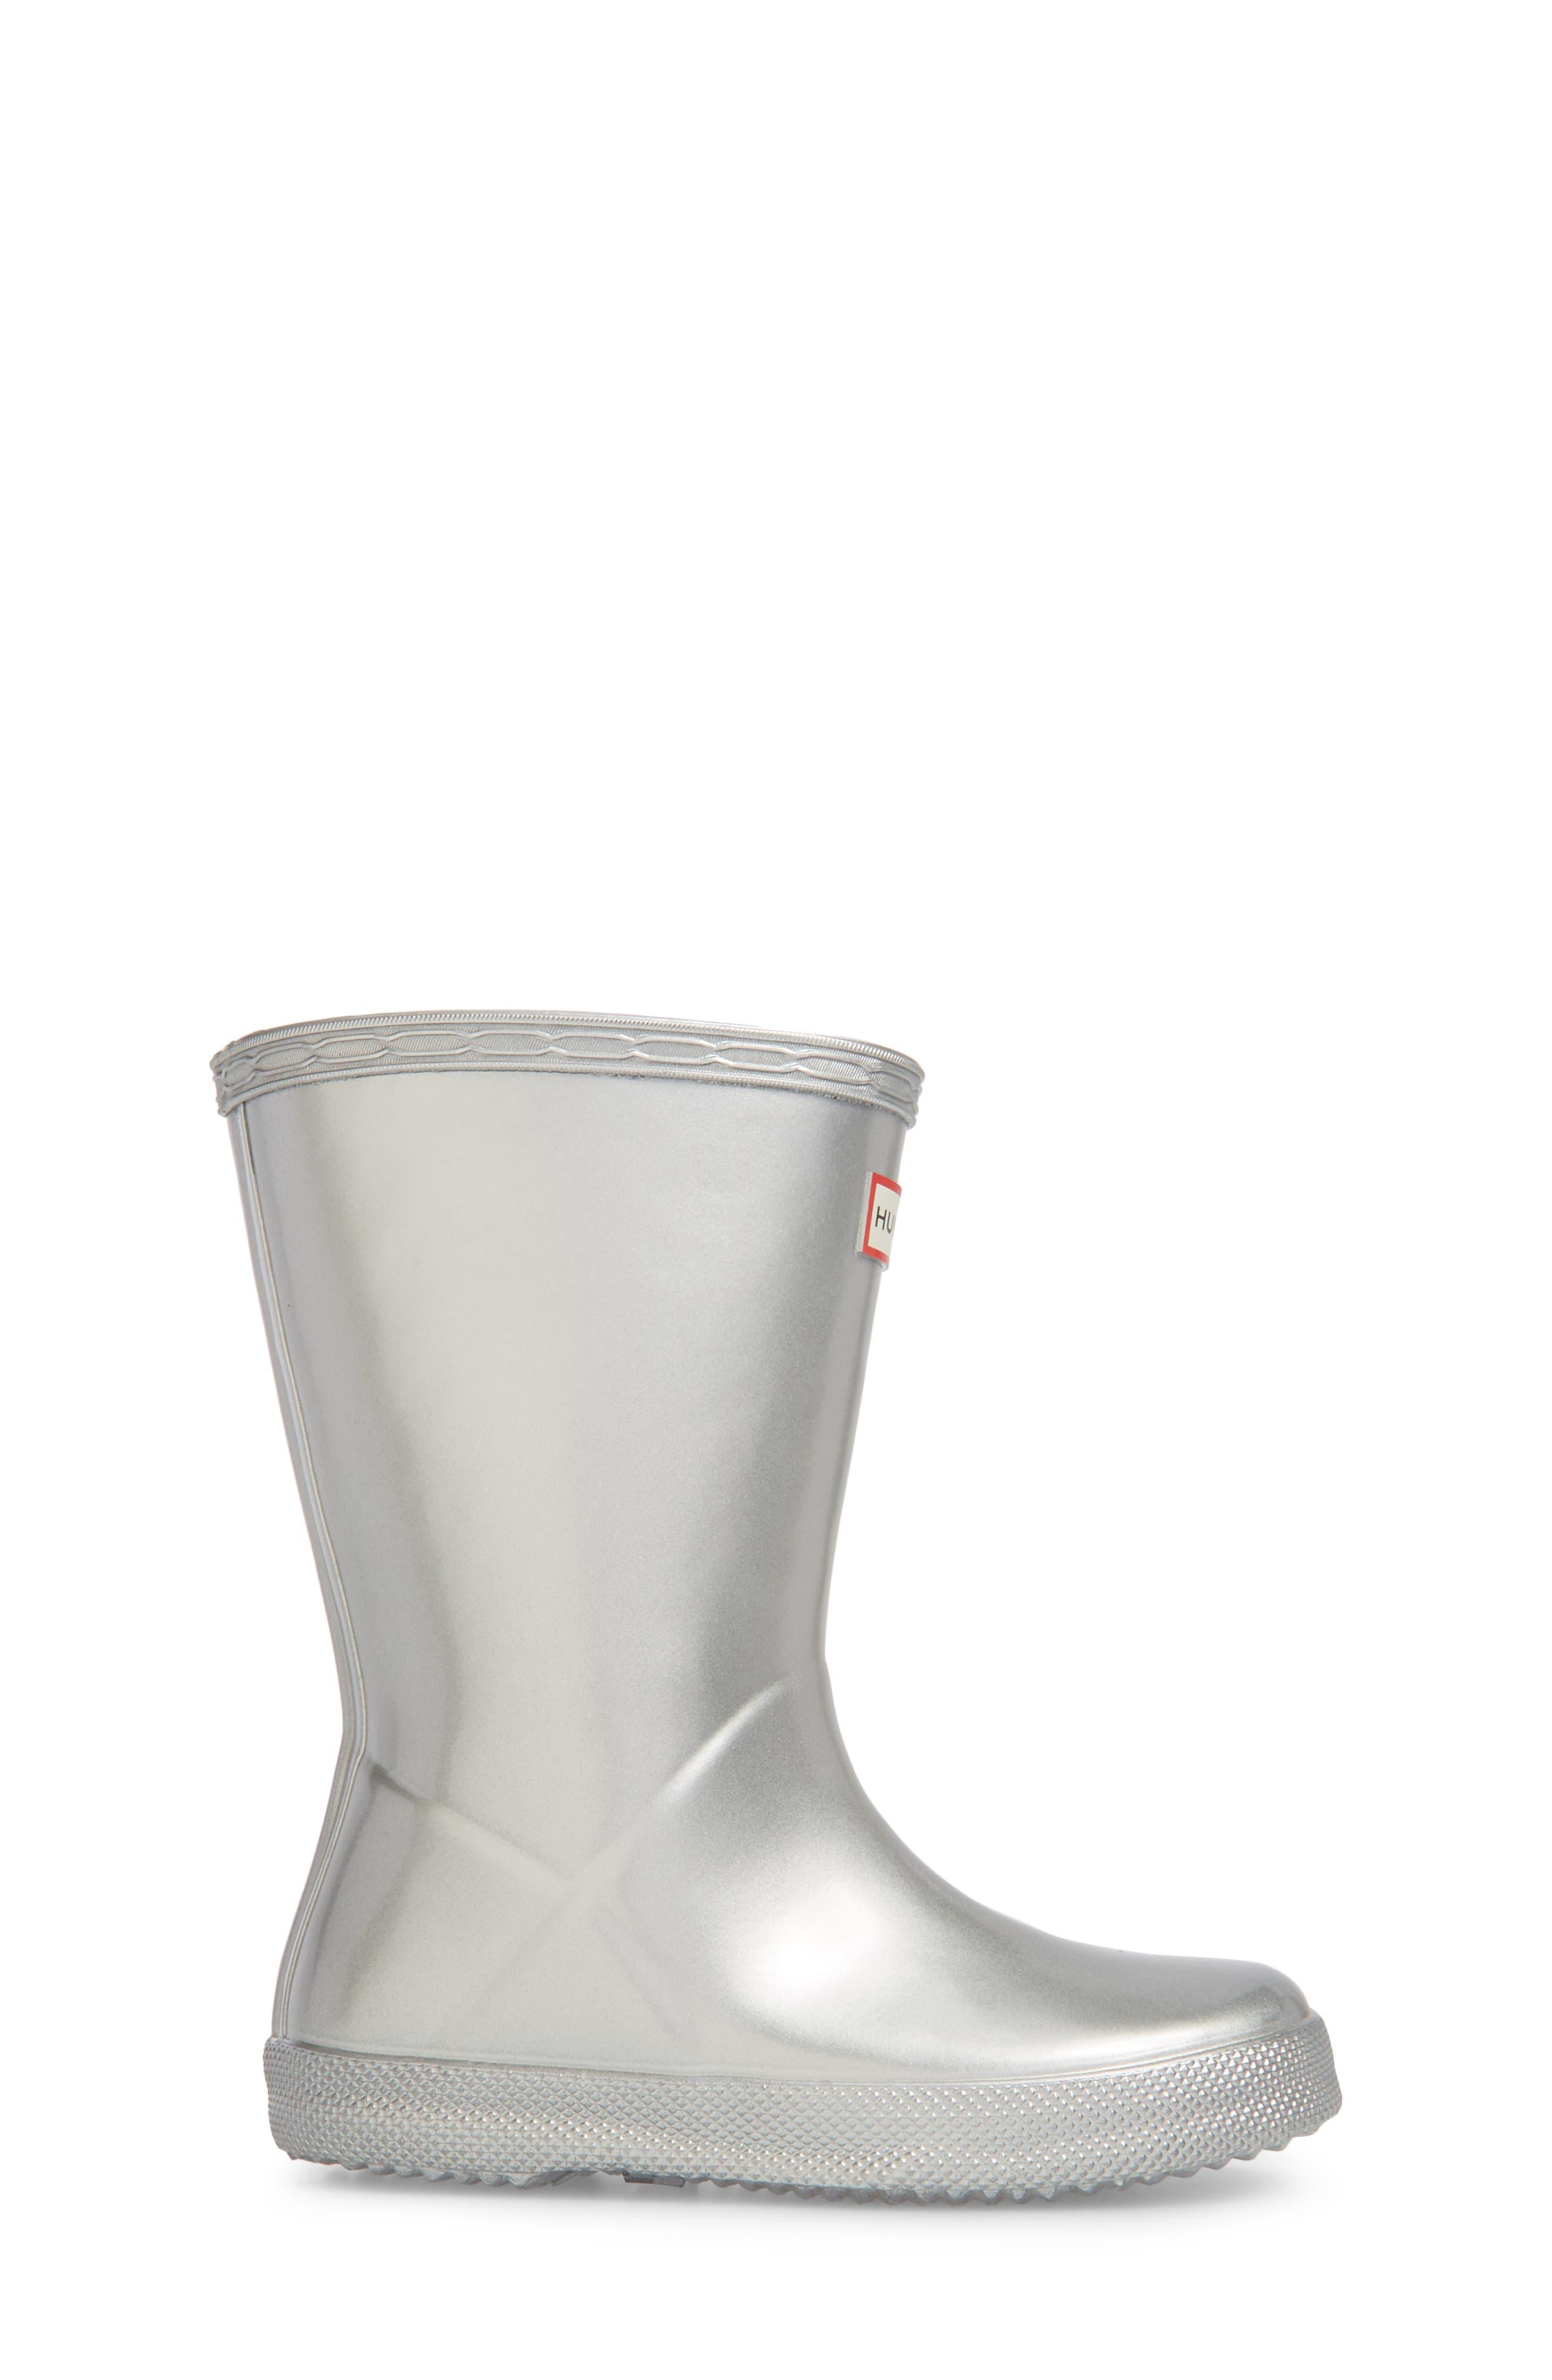 HUNTER,                             First Classic Metallic Waterproof Rain Boot,                             Alternate thumbnail 3, color,                             SILVER